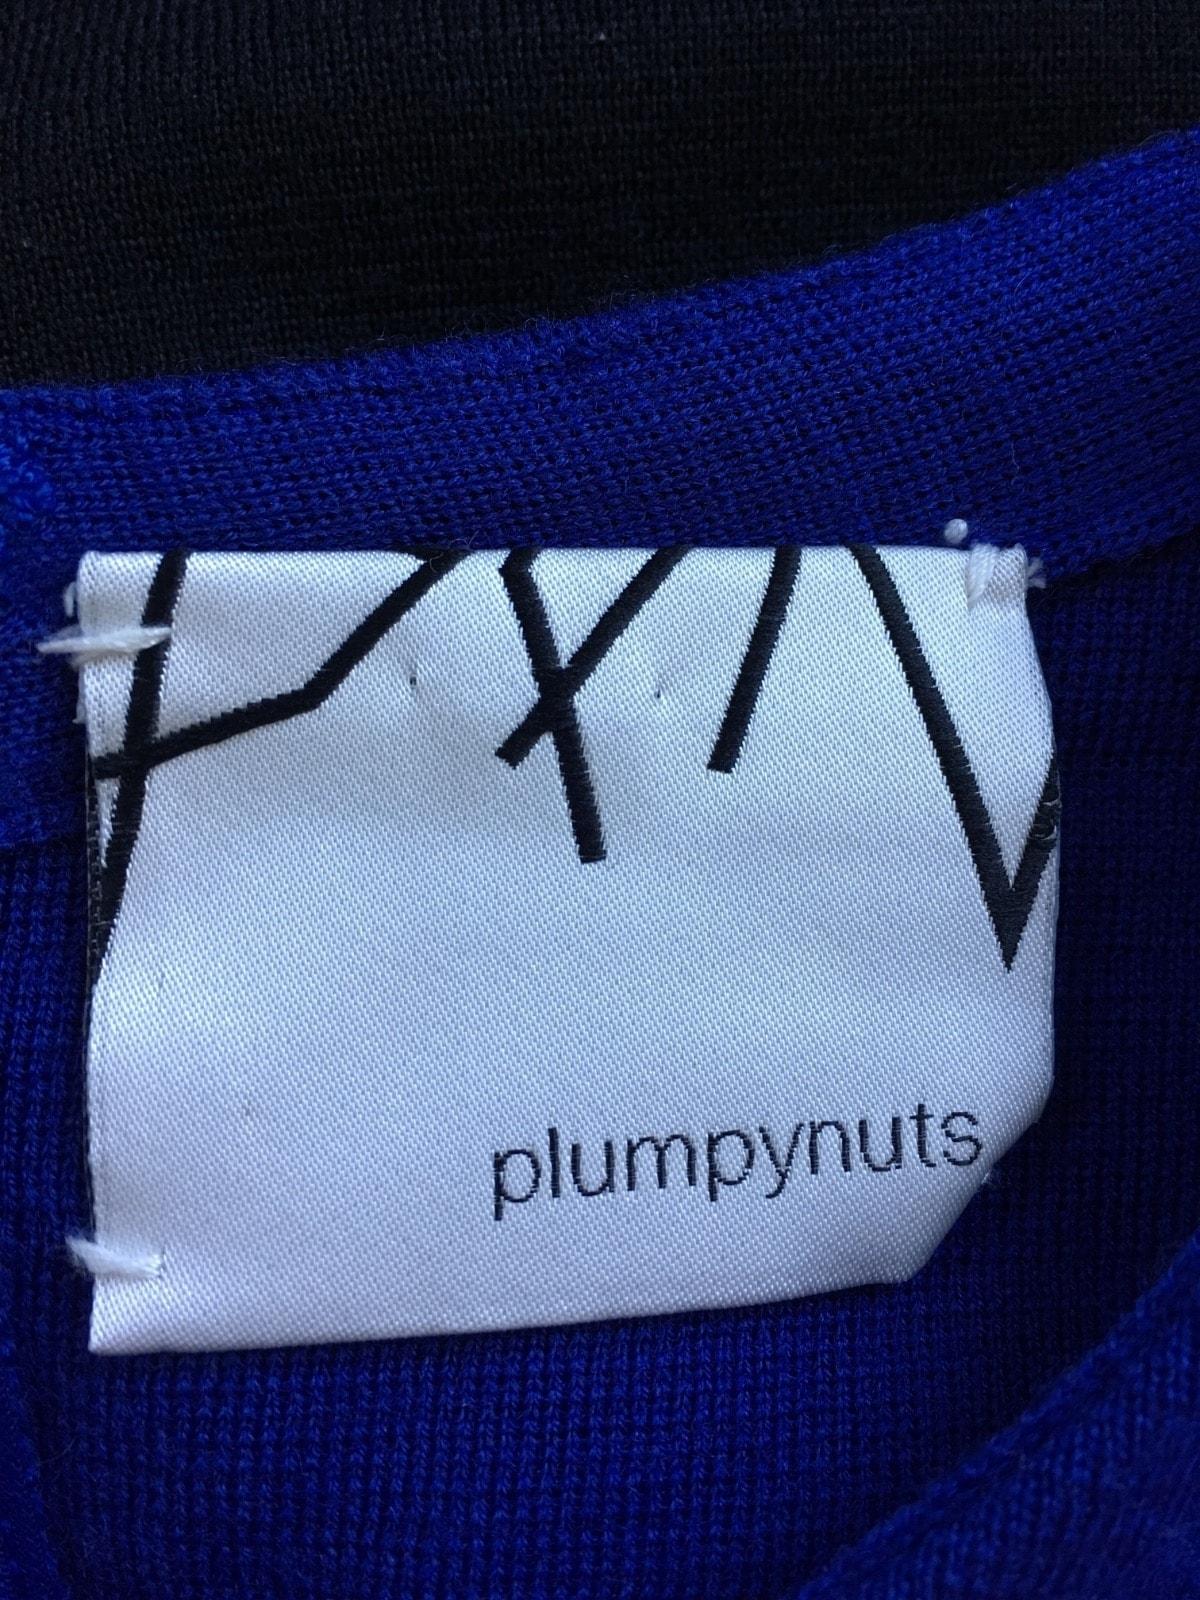 plumpynuts(プランピーナッツ)のワンピース